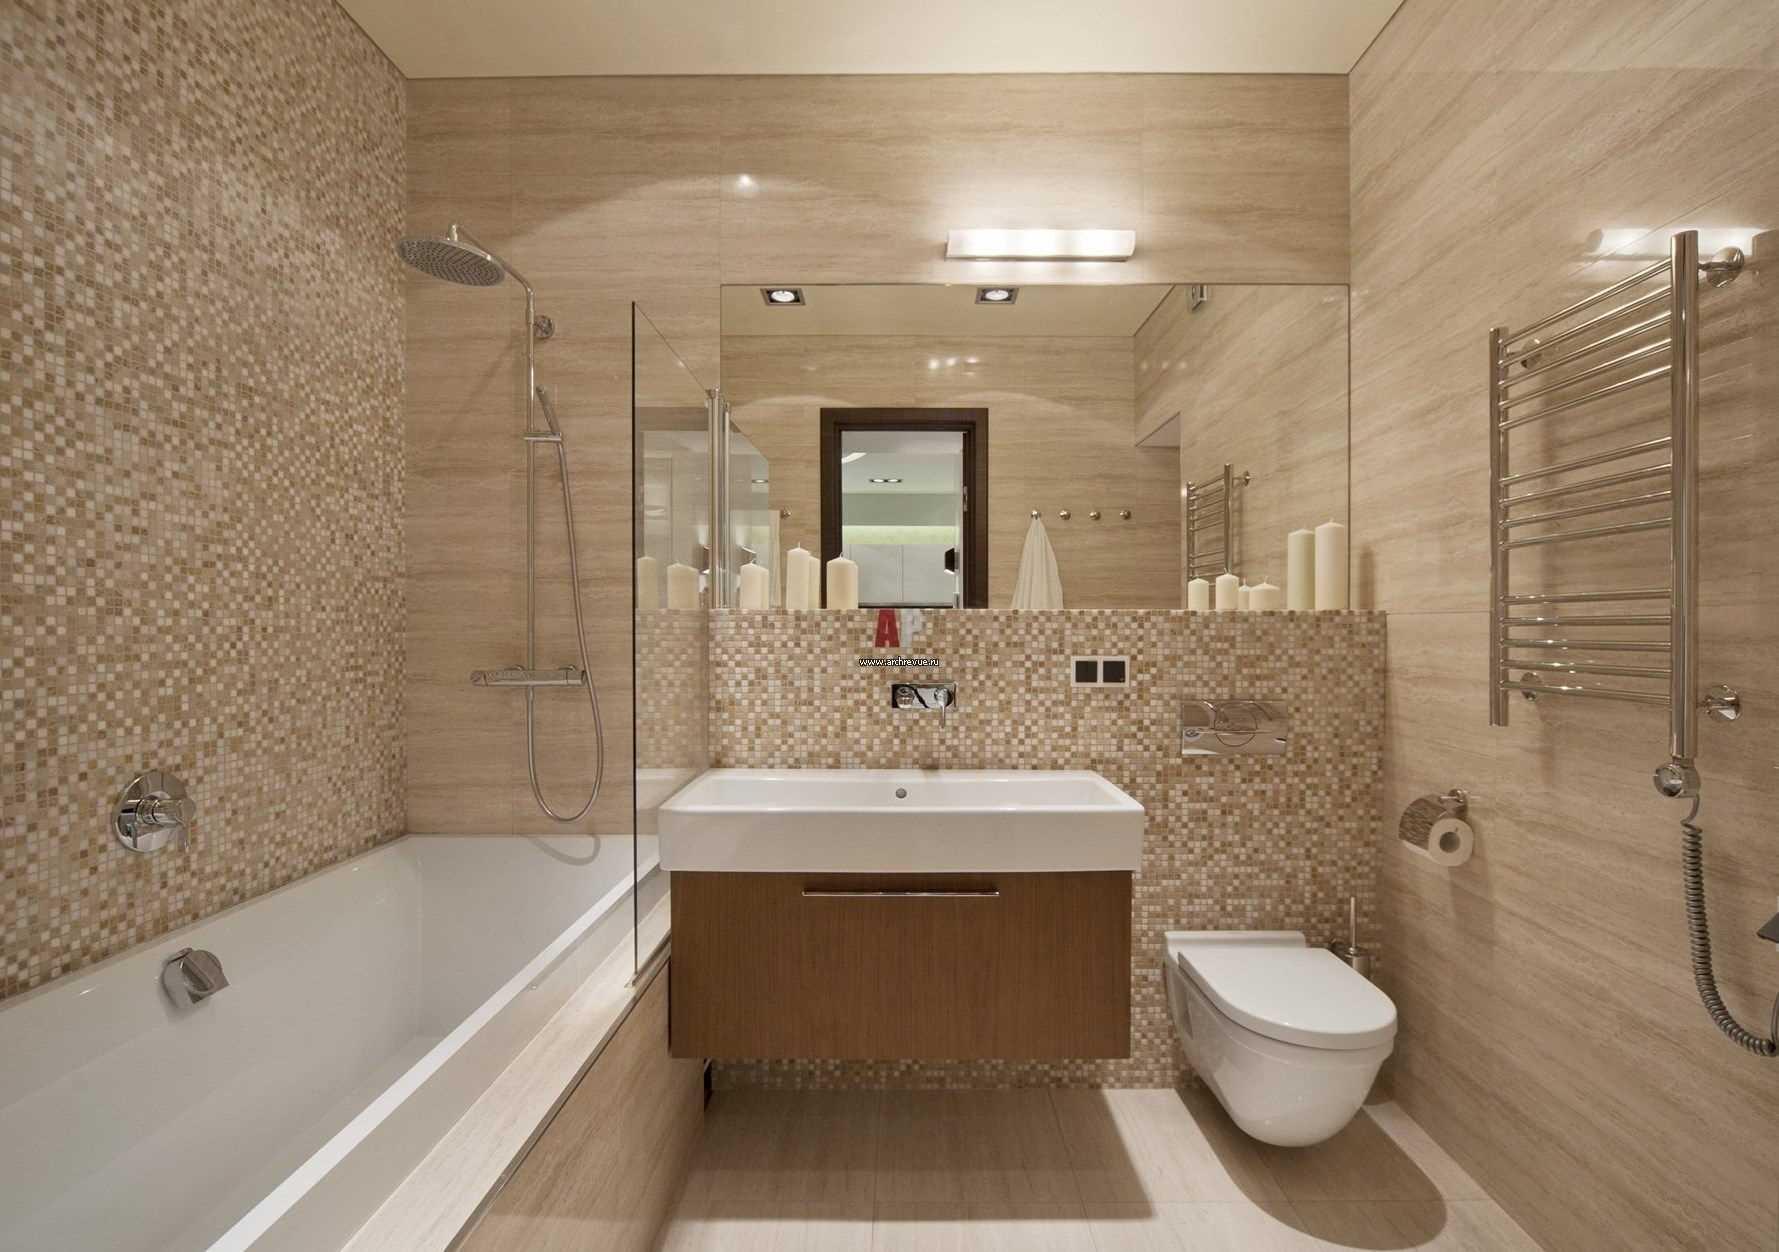 дизайн ванной комнаты фото 9